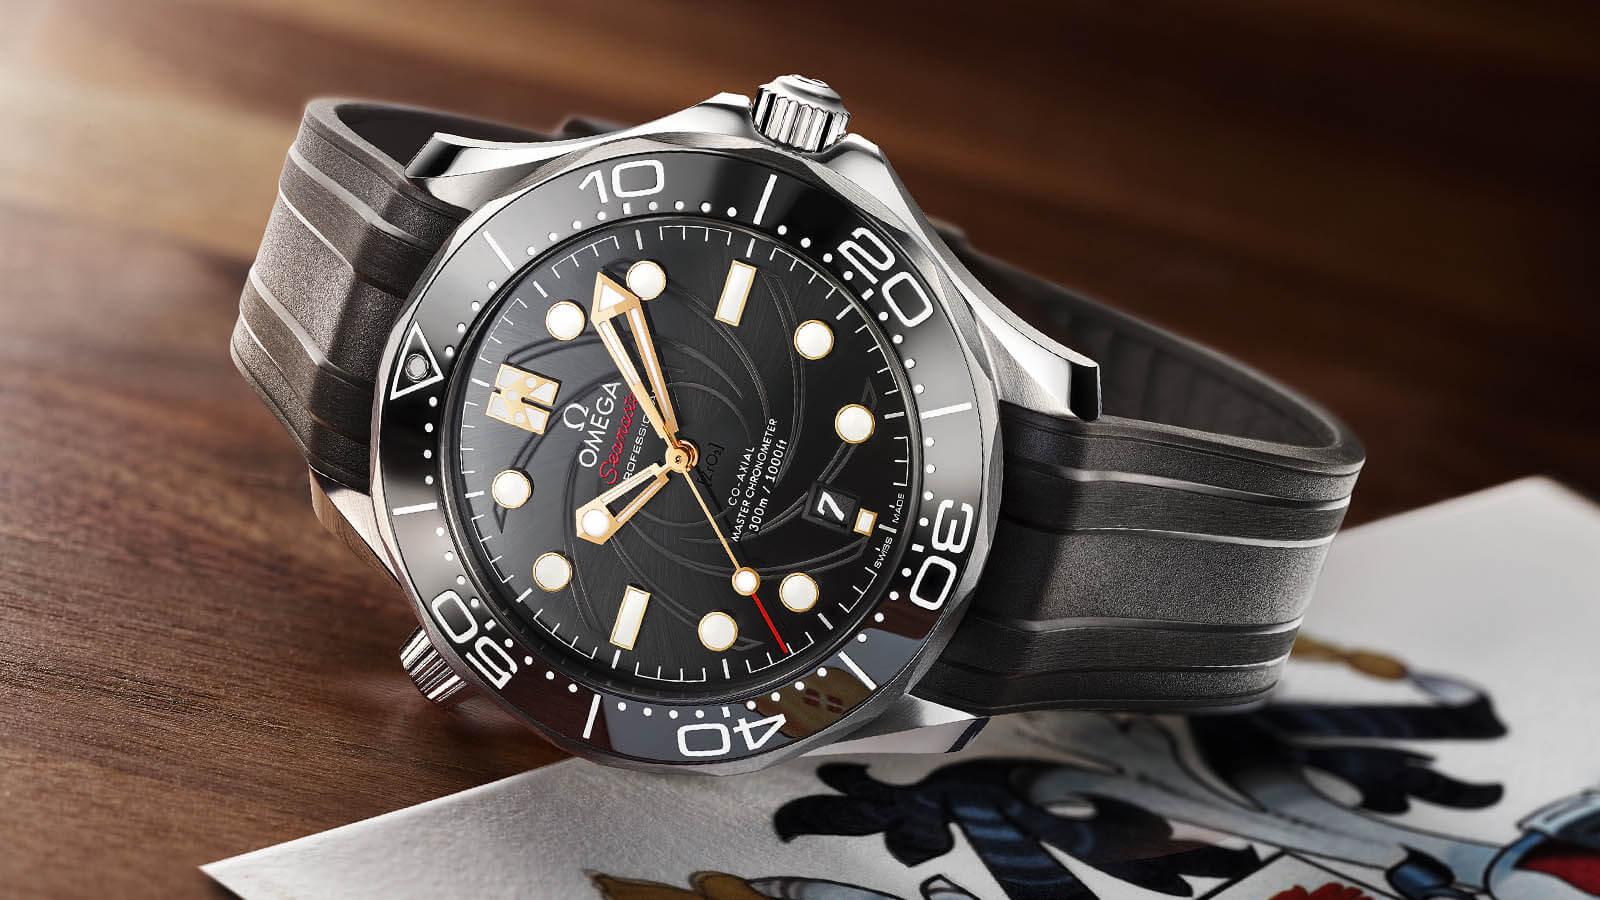 OMEGA Seamaster Diver 300 James Bond Limited Edition an schwarzem Kautschukband